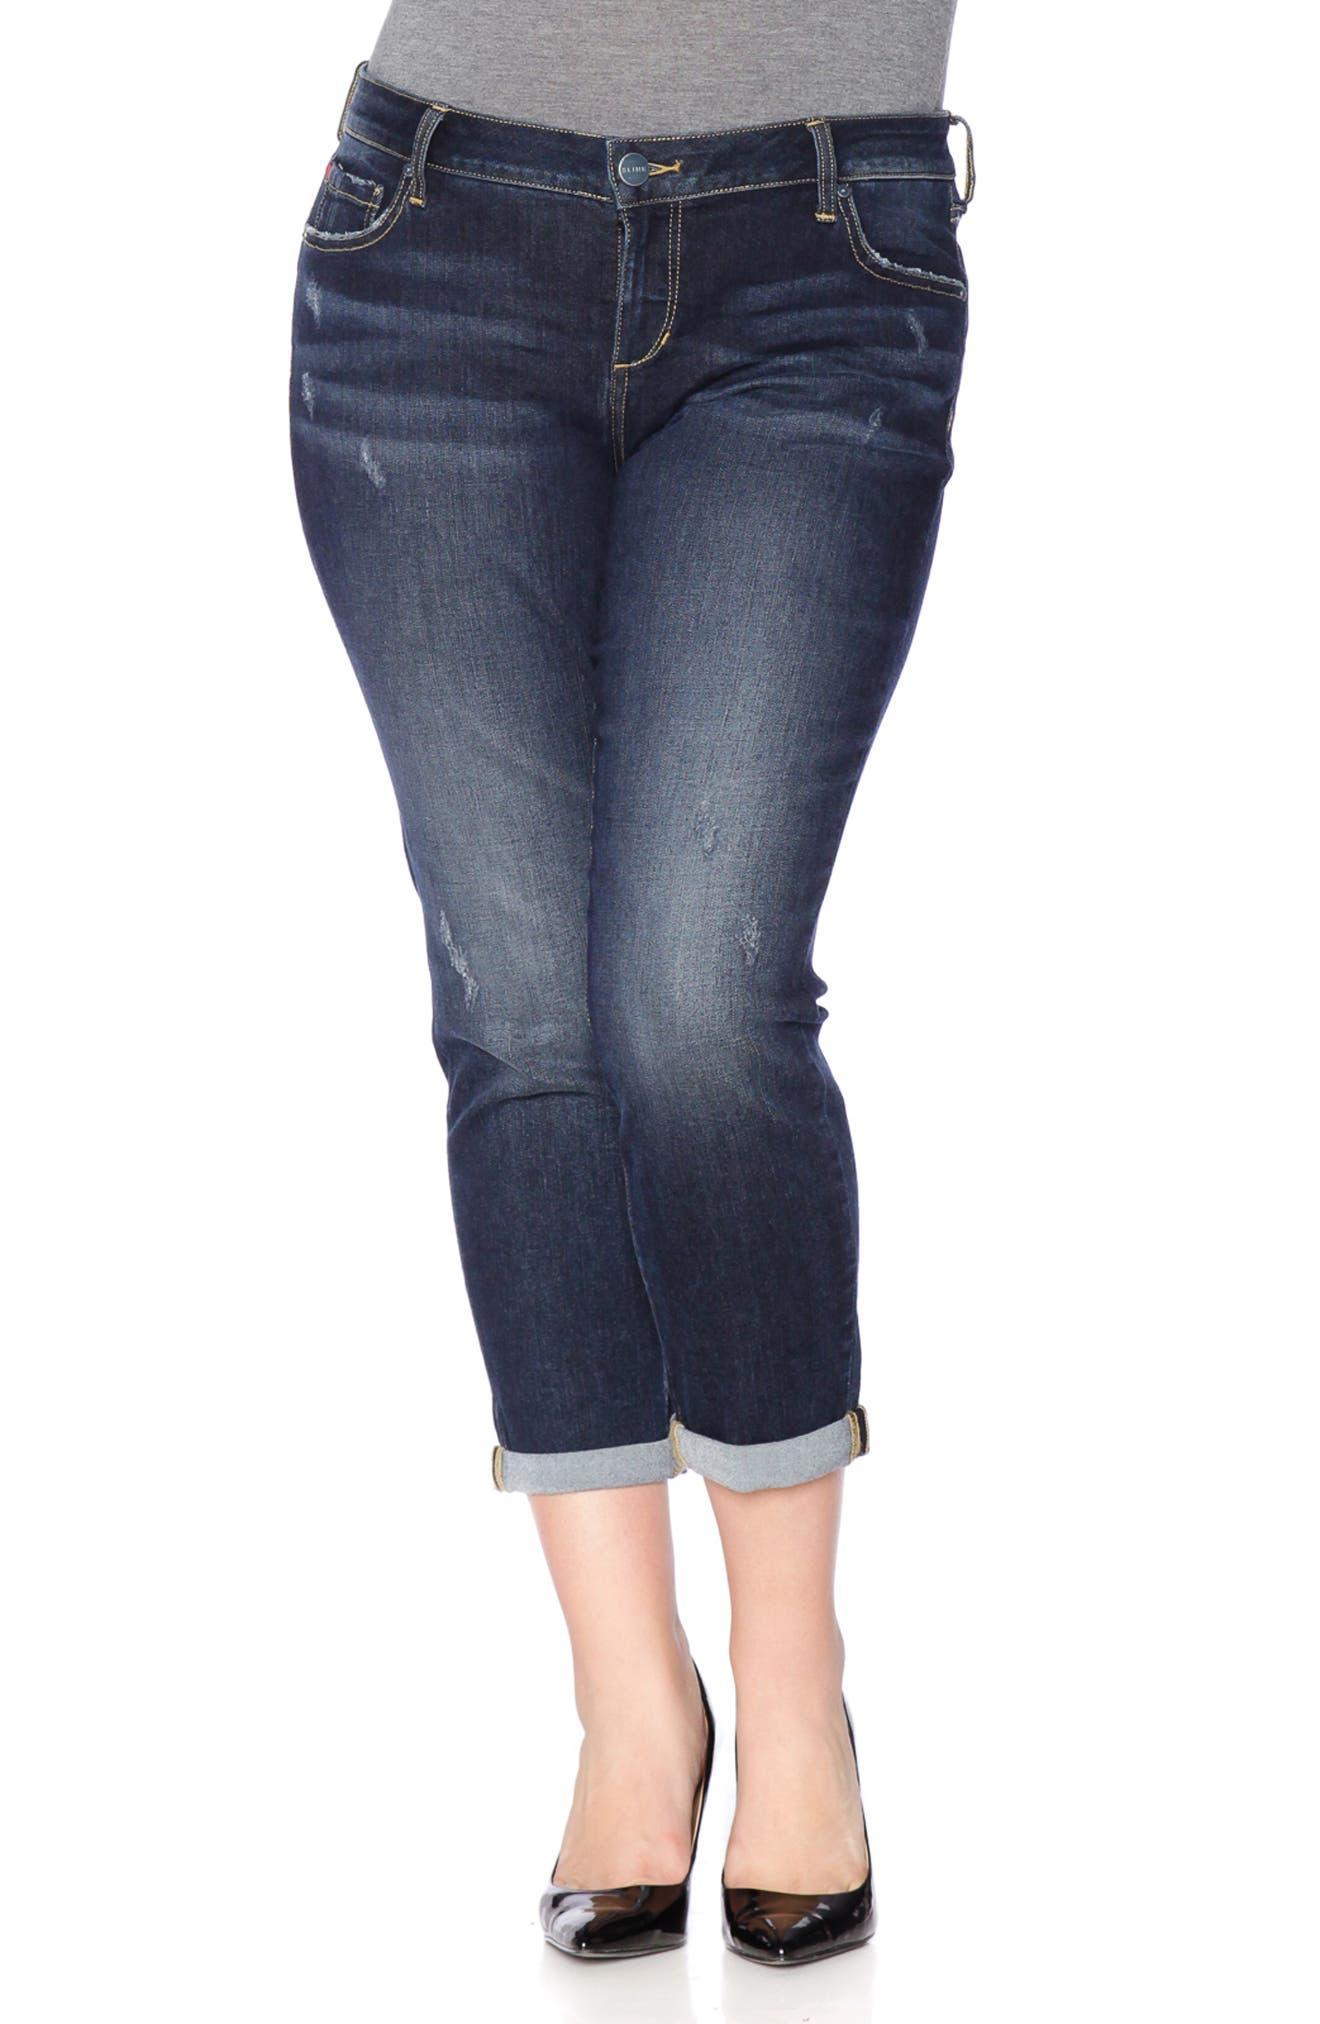 SLINK JEANS, Stretch Ankle Boyfriend Jeans, Main thumbnail 1, color, BELLA